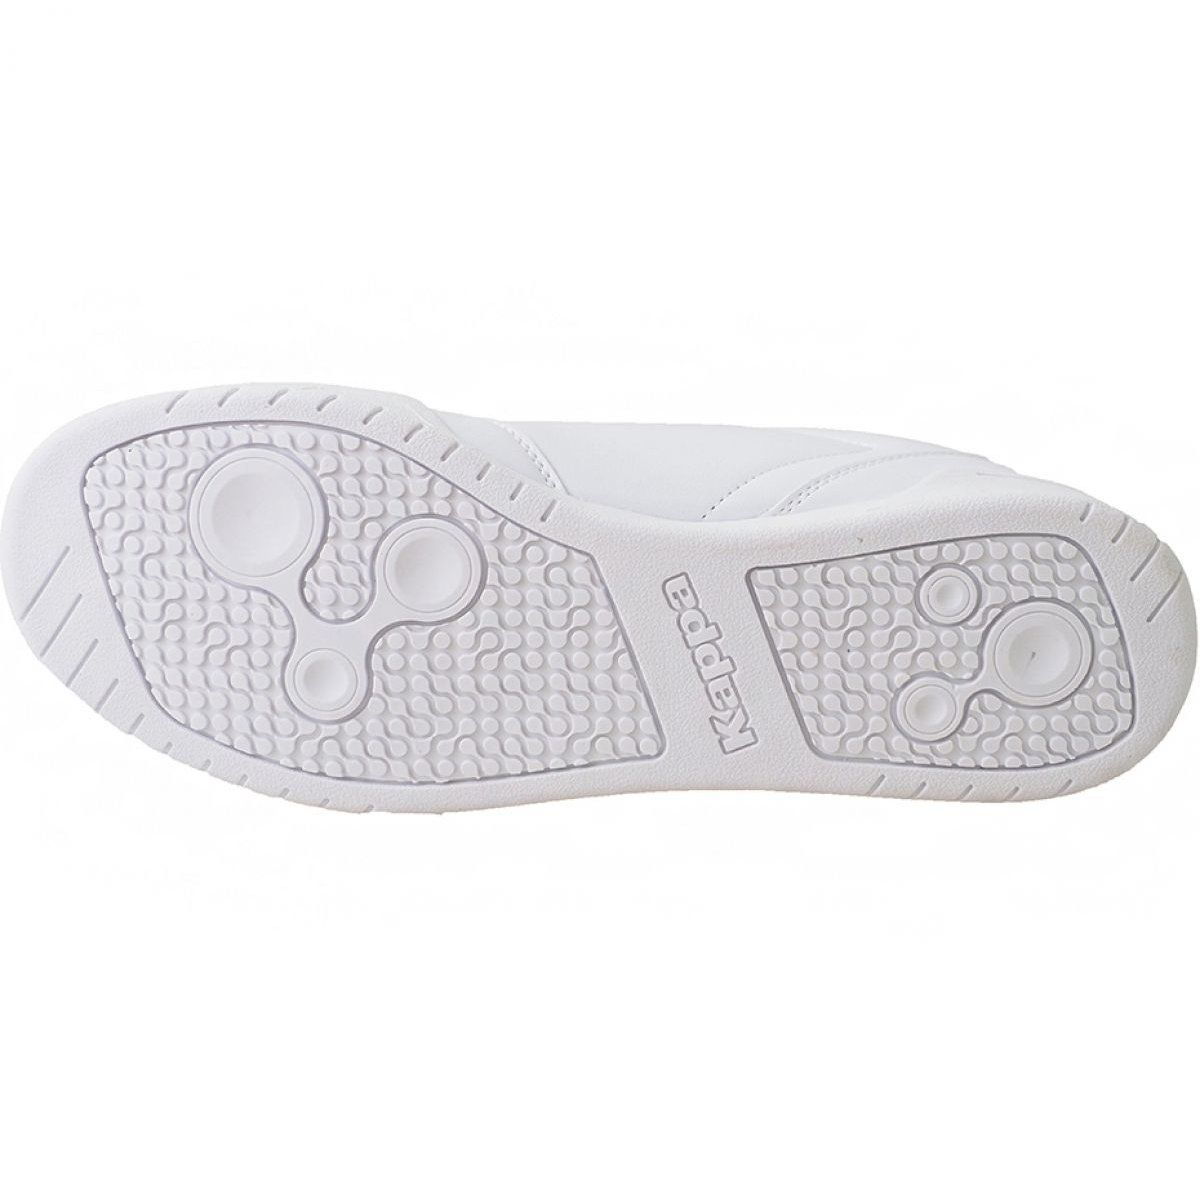 Buty Kappa Marabu M 242765 1020 Biale Shoes Classic Sneakers Slip On Sneaker